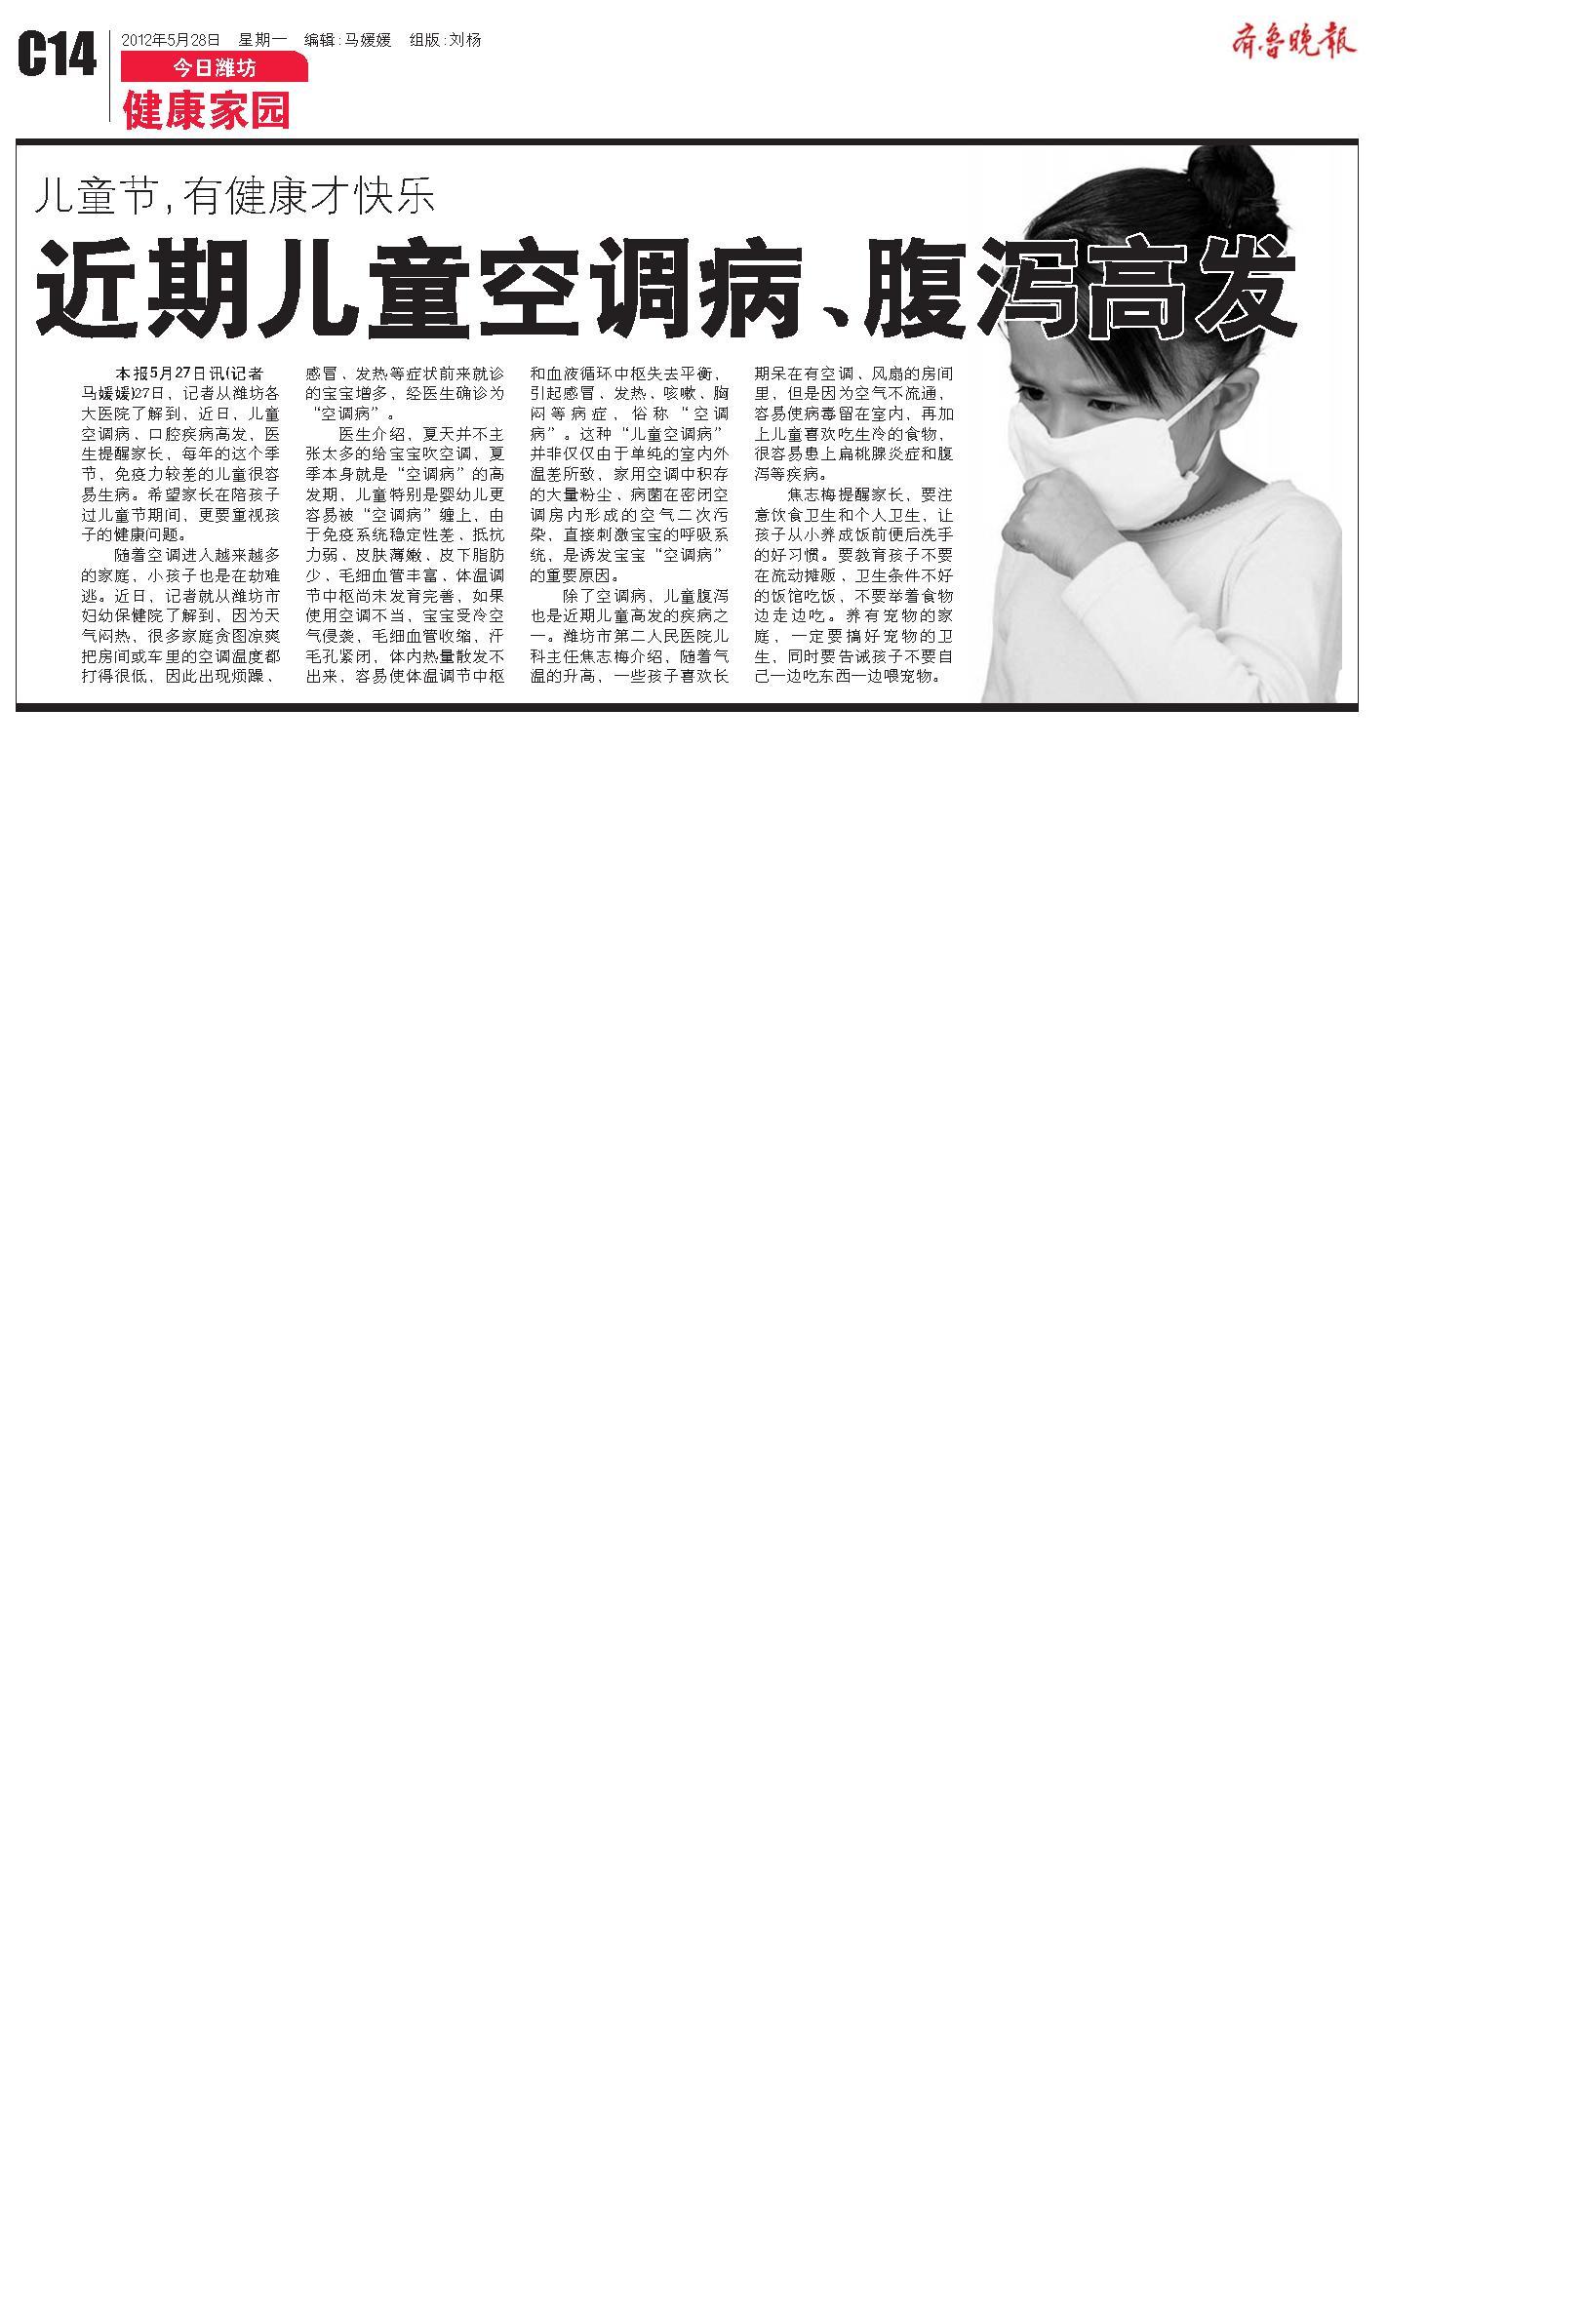 epaper.qlwb.com.cn - /qlwb/IMAGE/20120528/K14/